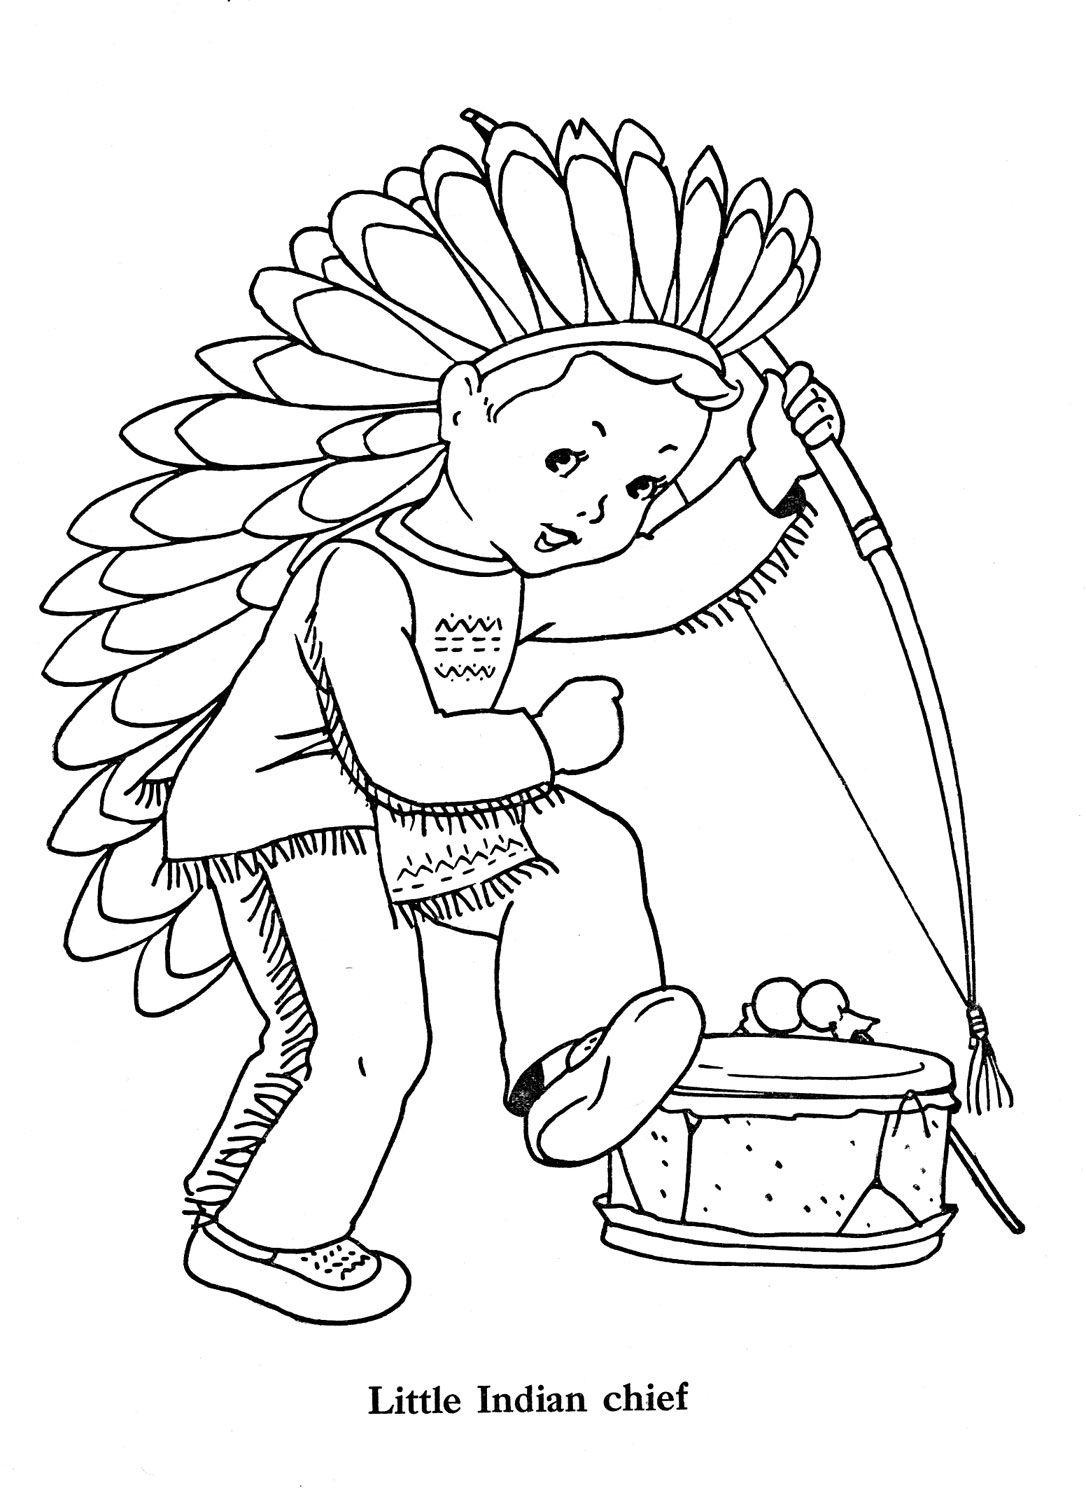 littleindianchiefjpg 10861488 pixels  Thanksgiving coloring